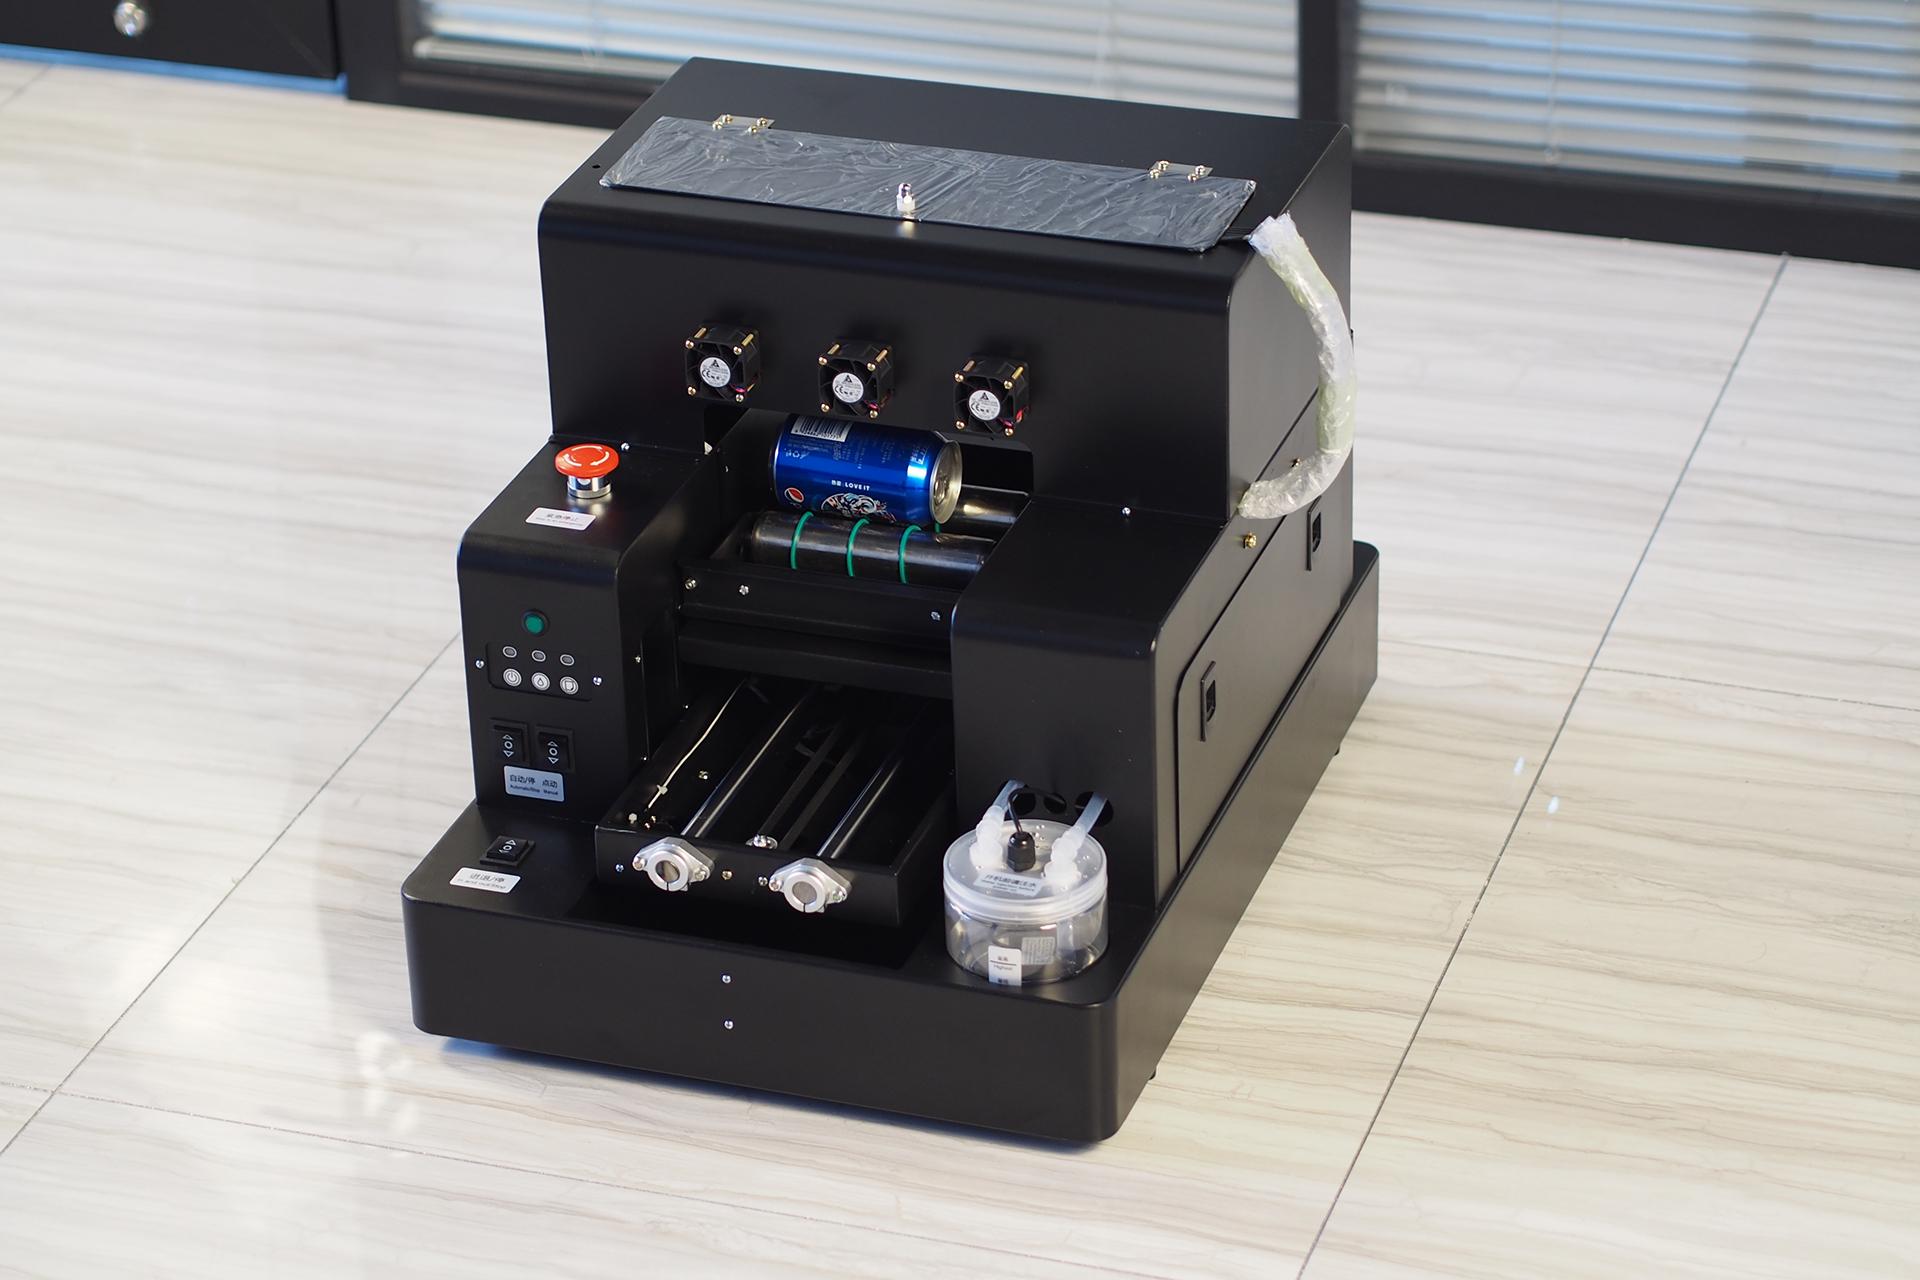 Digitale drukmachine A4 prijs telefoon case fles sylinder drukmachine uv printer